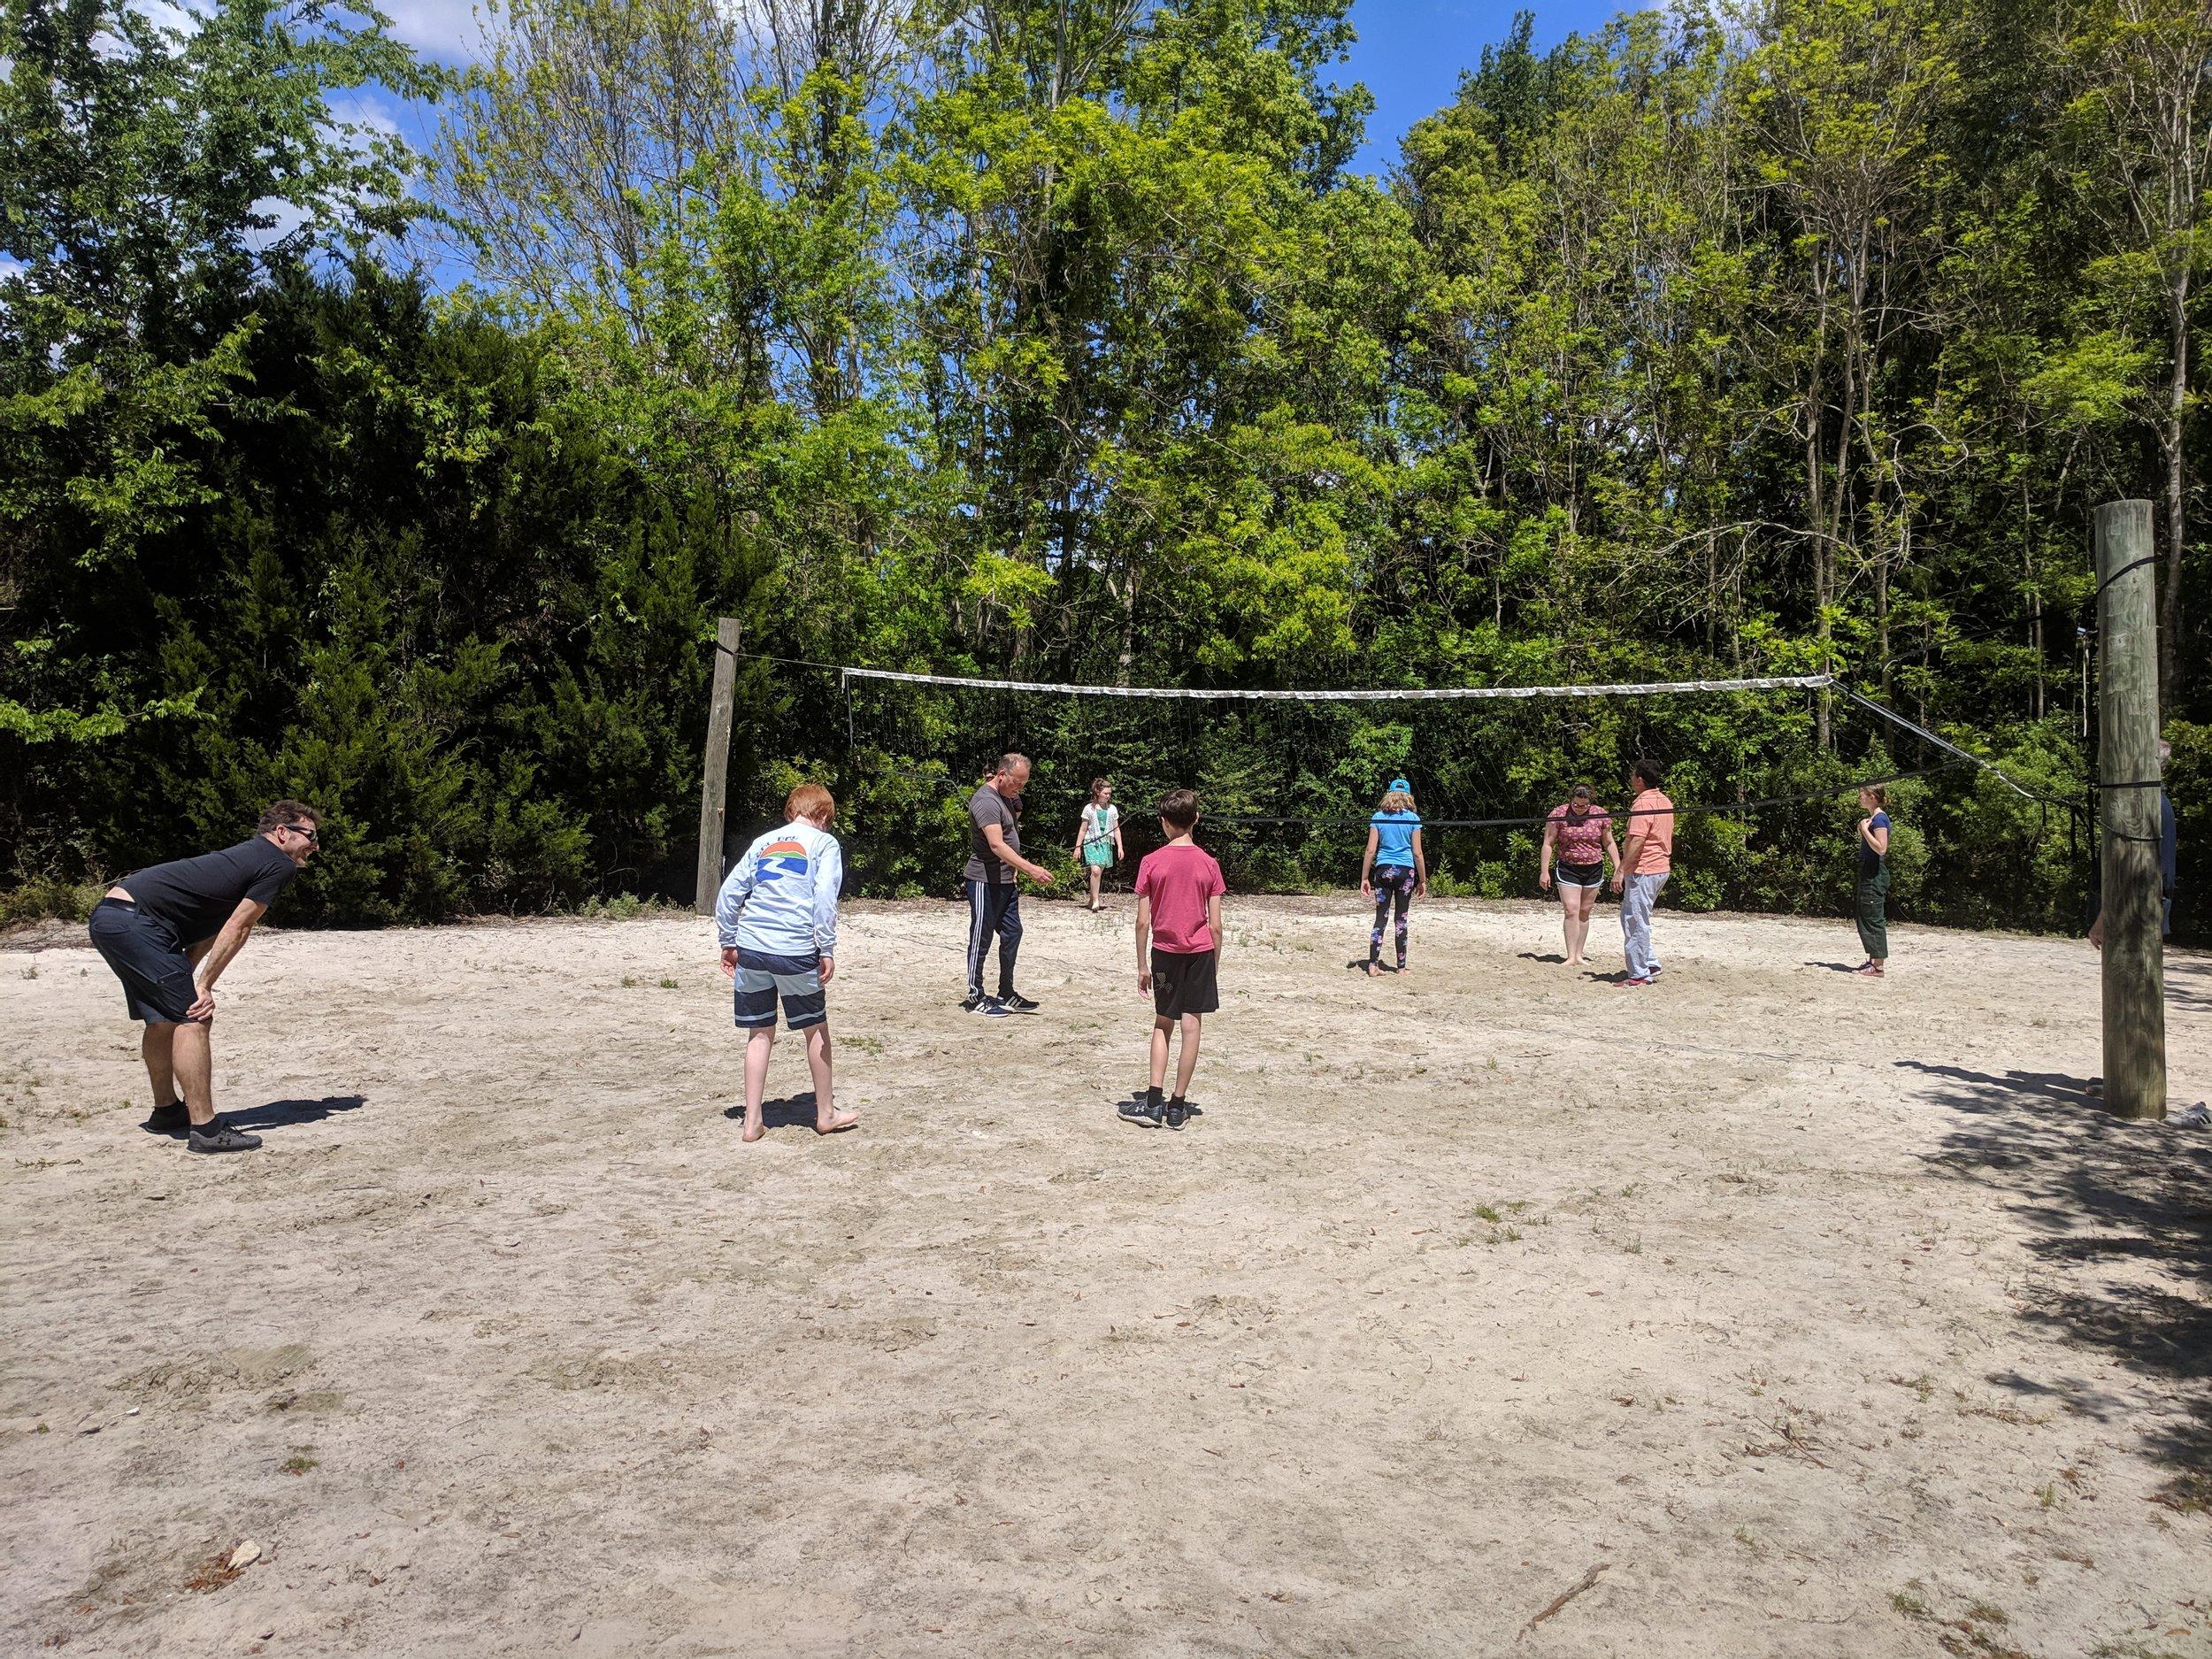 20190421_Volleyball.jpg